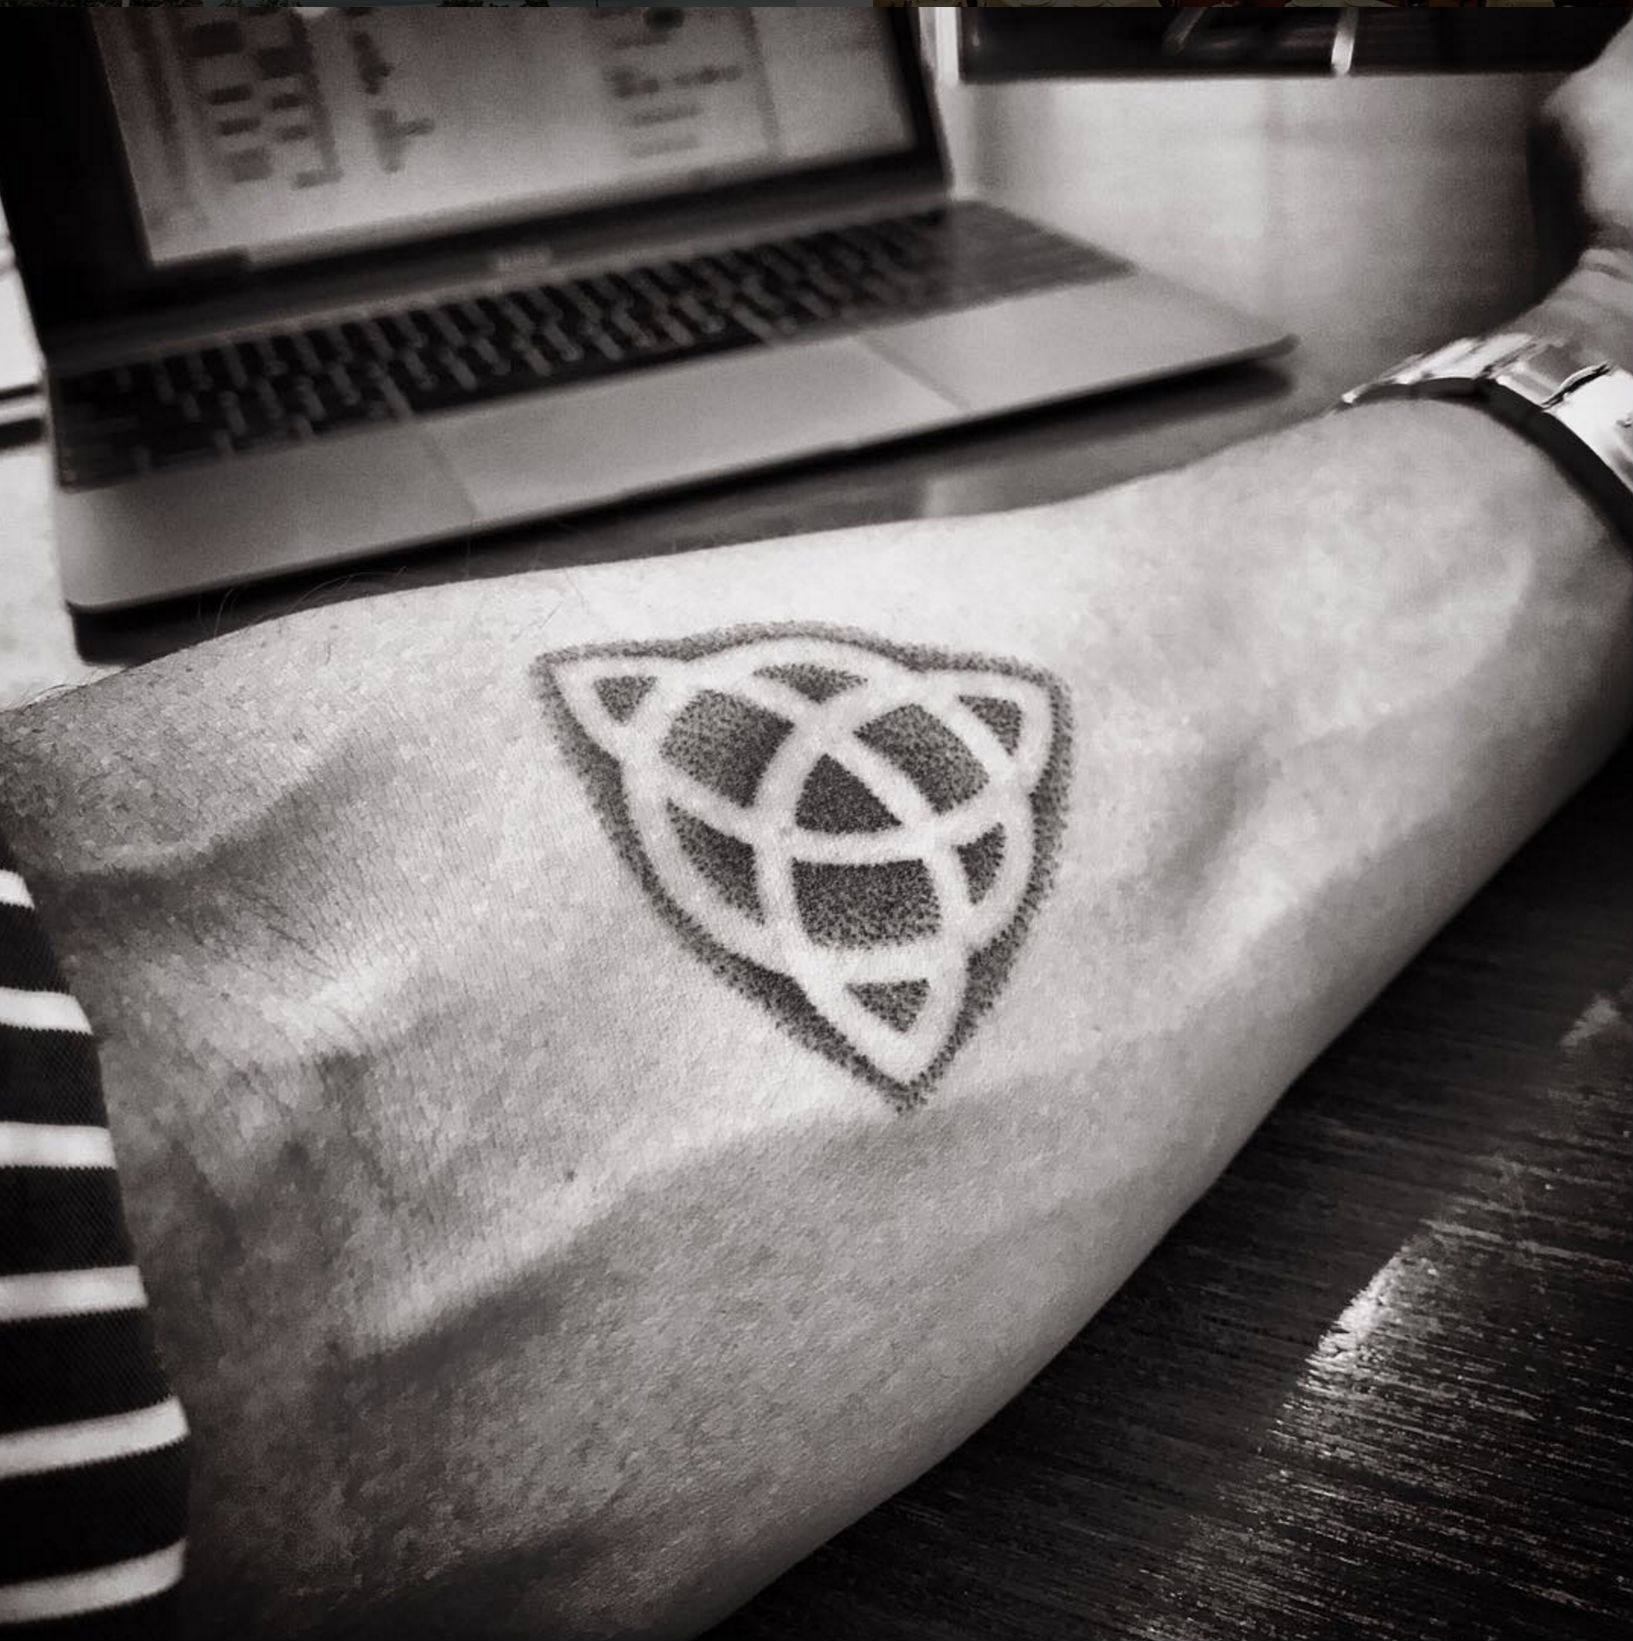 entintado tatooo.jpg